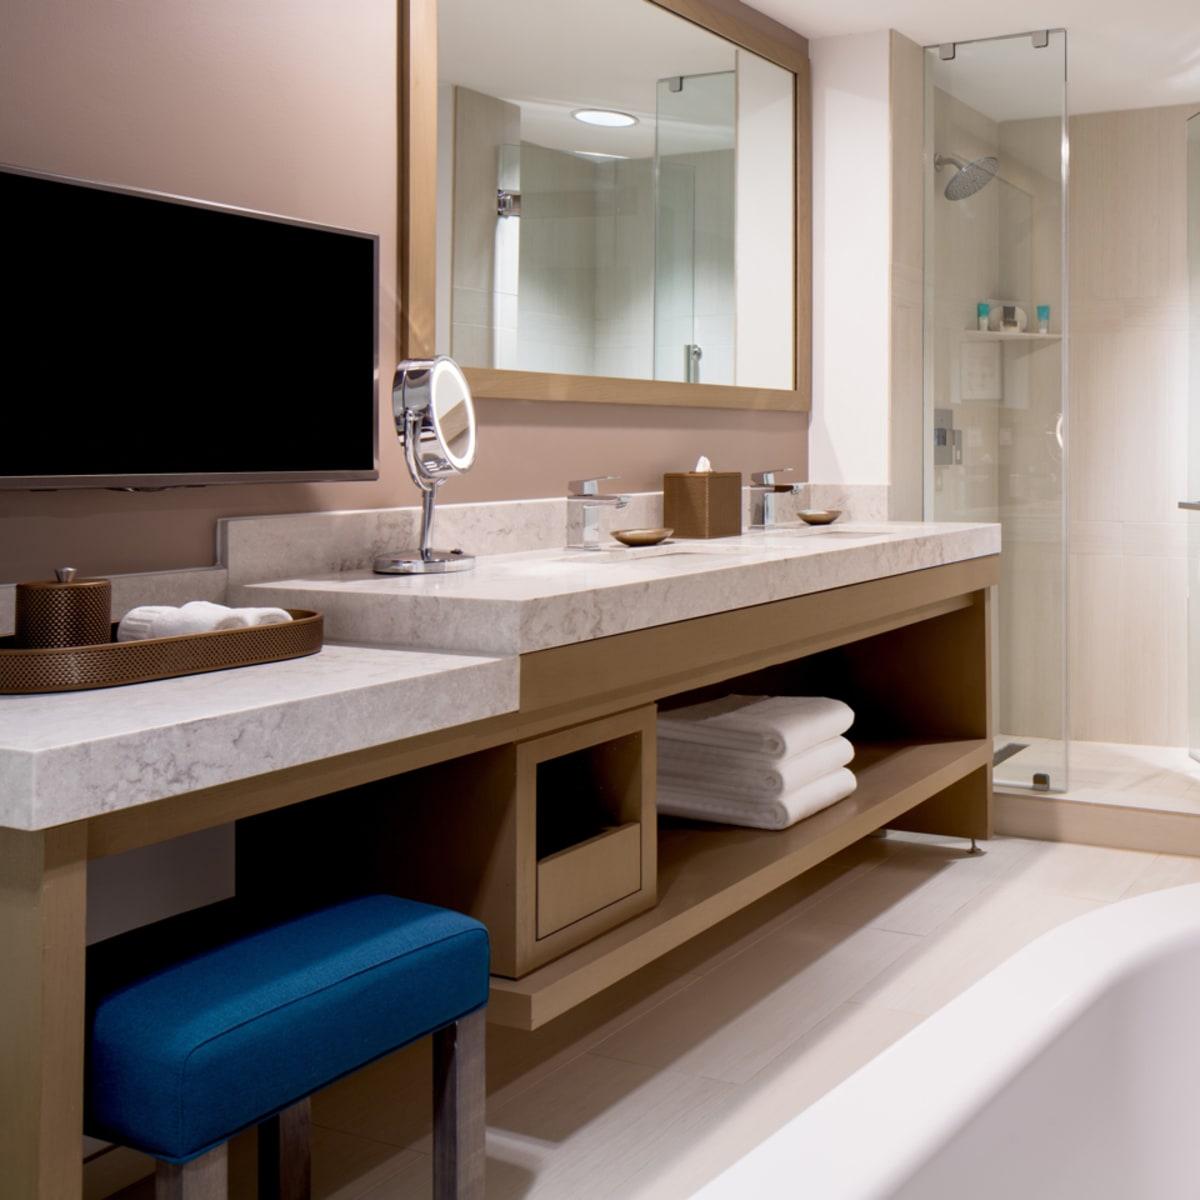 Hyatt Regency two story suites master bath 2